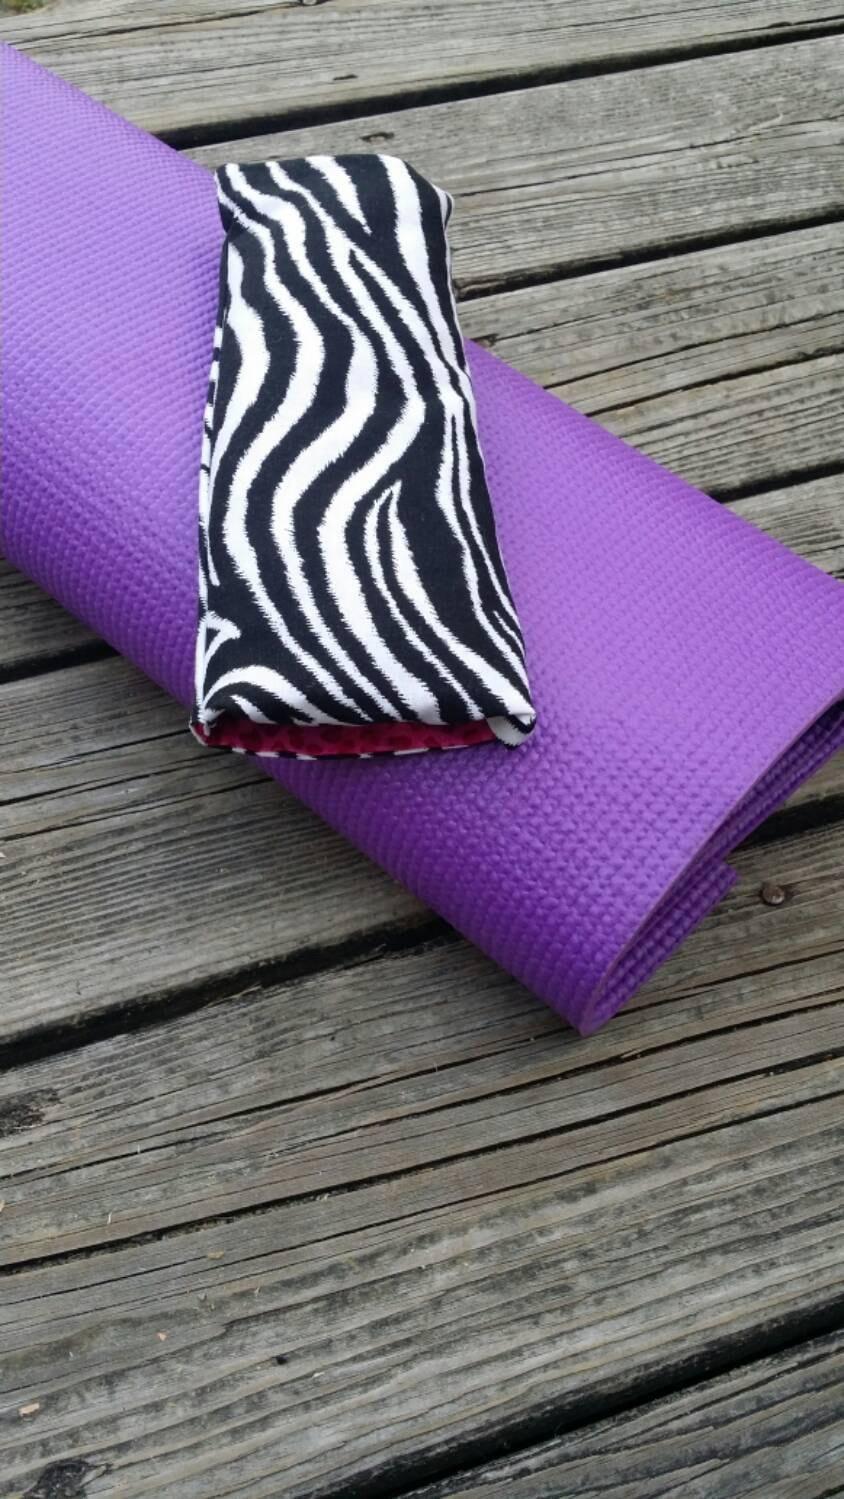 Yoga Eye Pillow / Relaxing Eye Pillow animal prints cover / yoga accessories / Meditation Eye ...